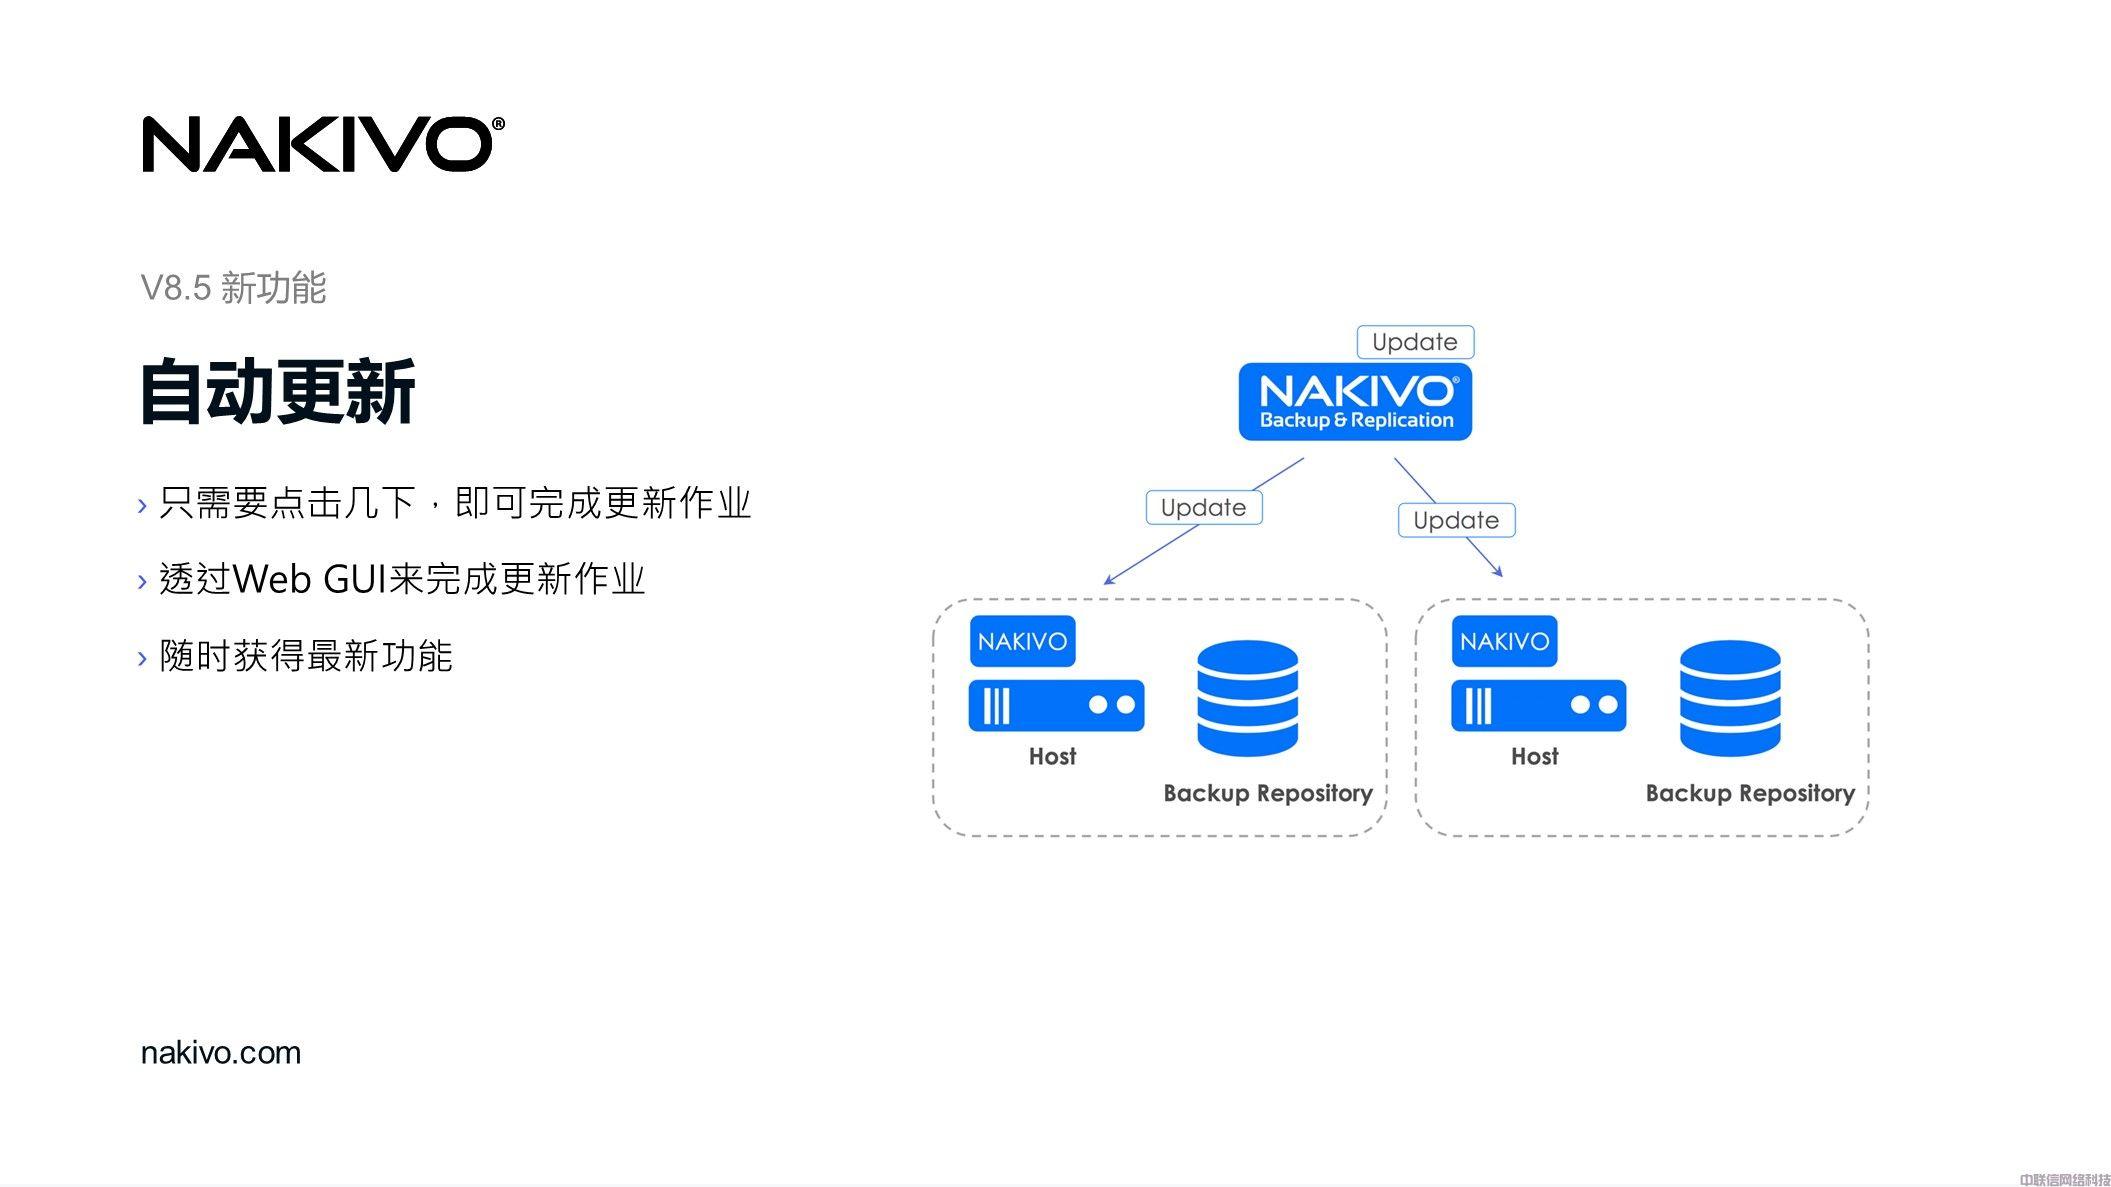 虚拟化备份方案NAKIVO Backup & Replication(图39)